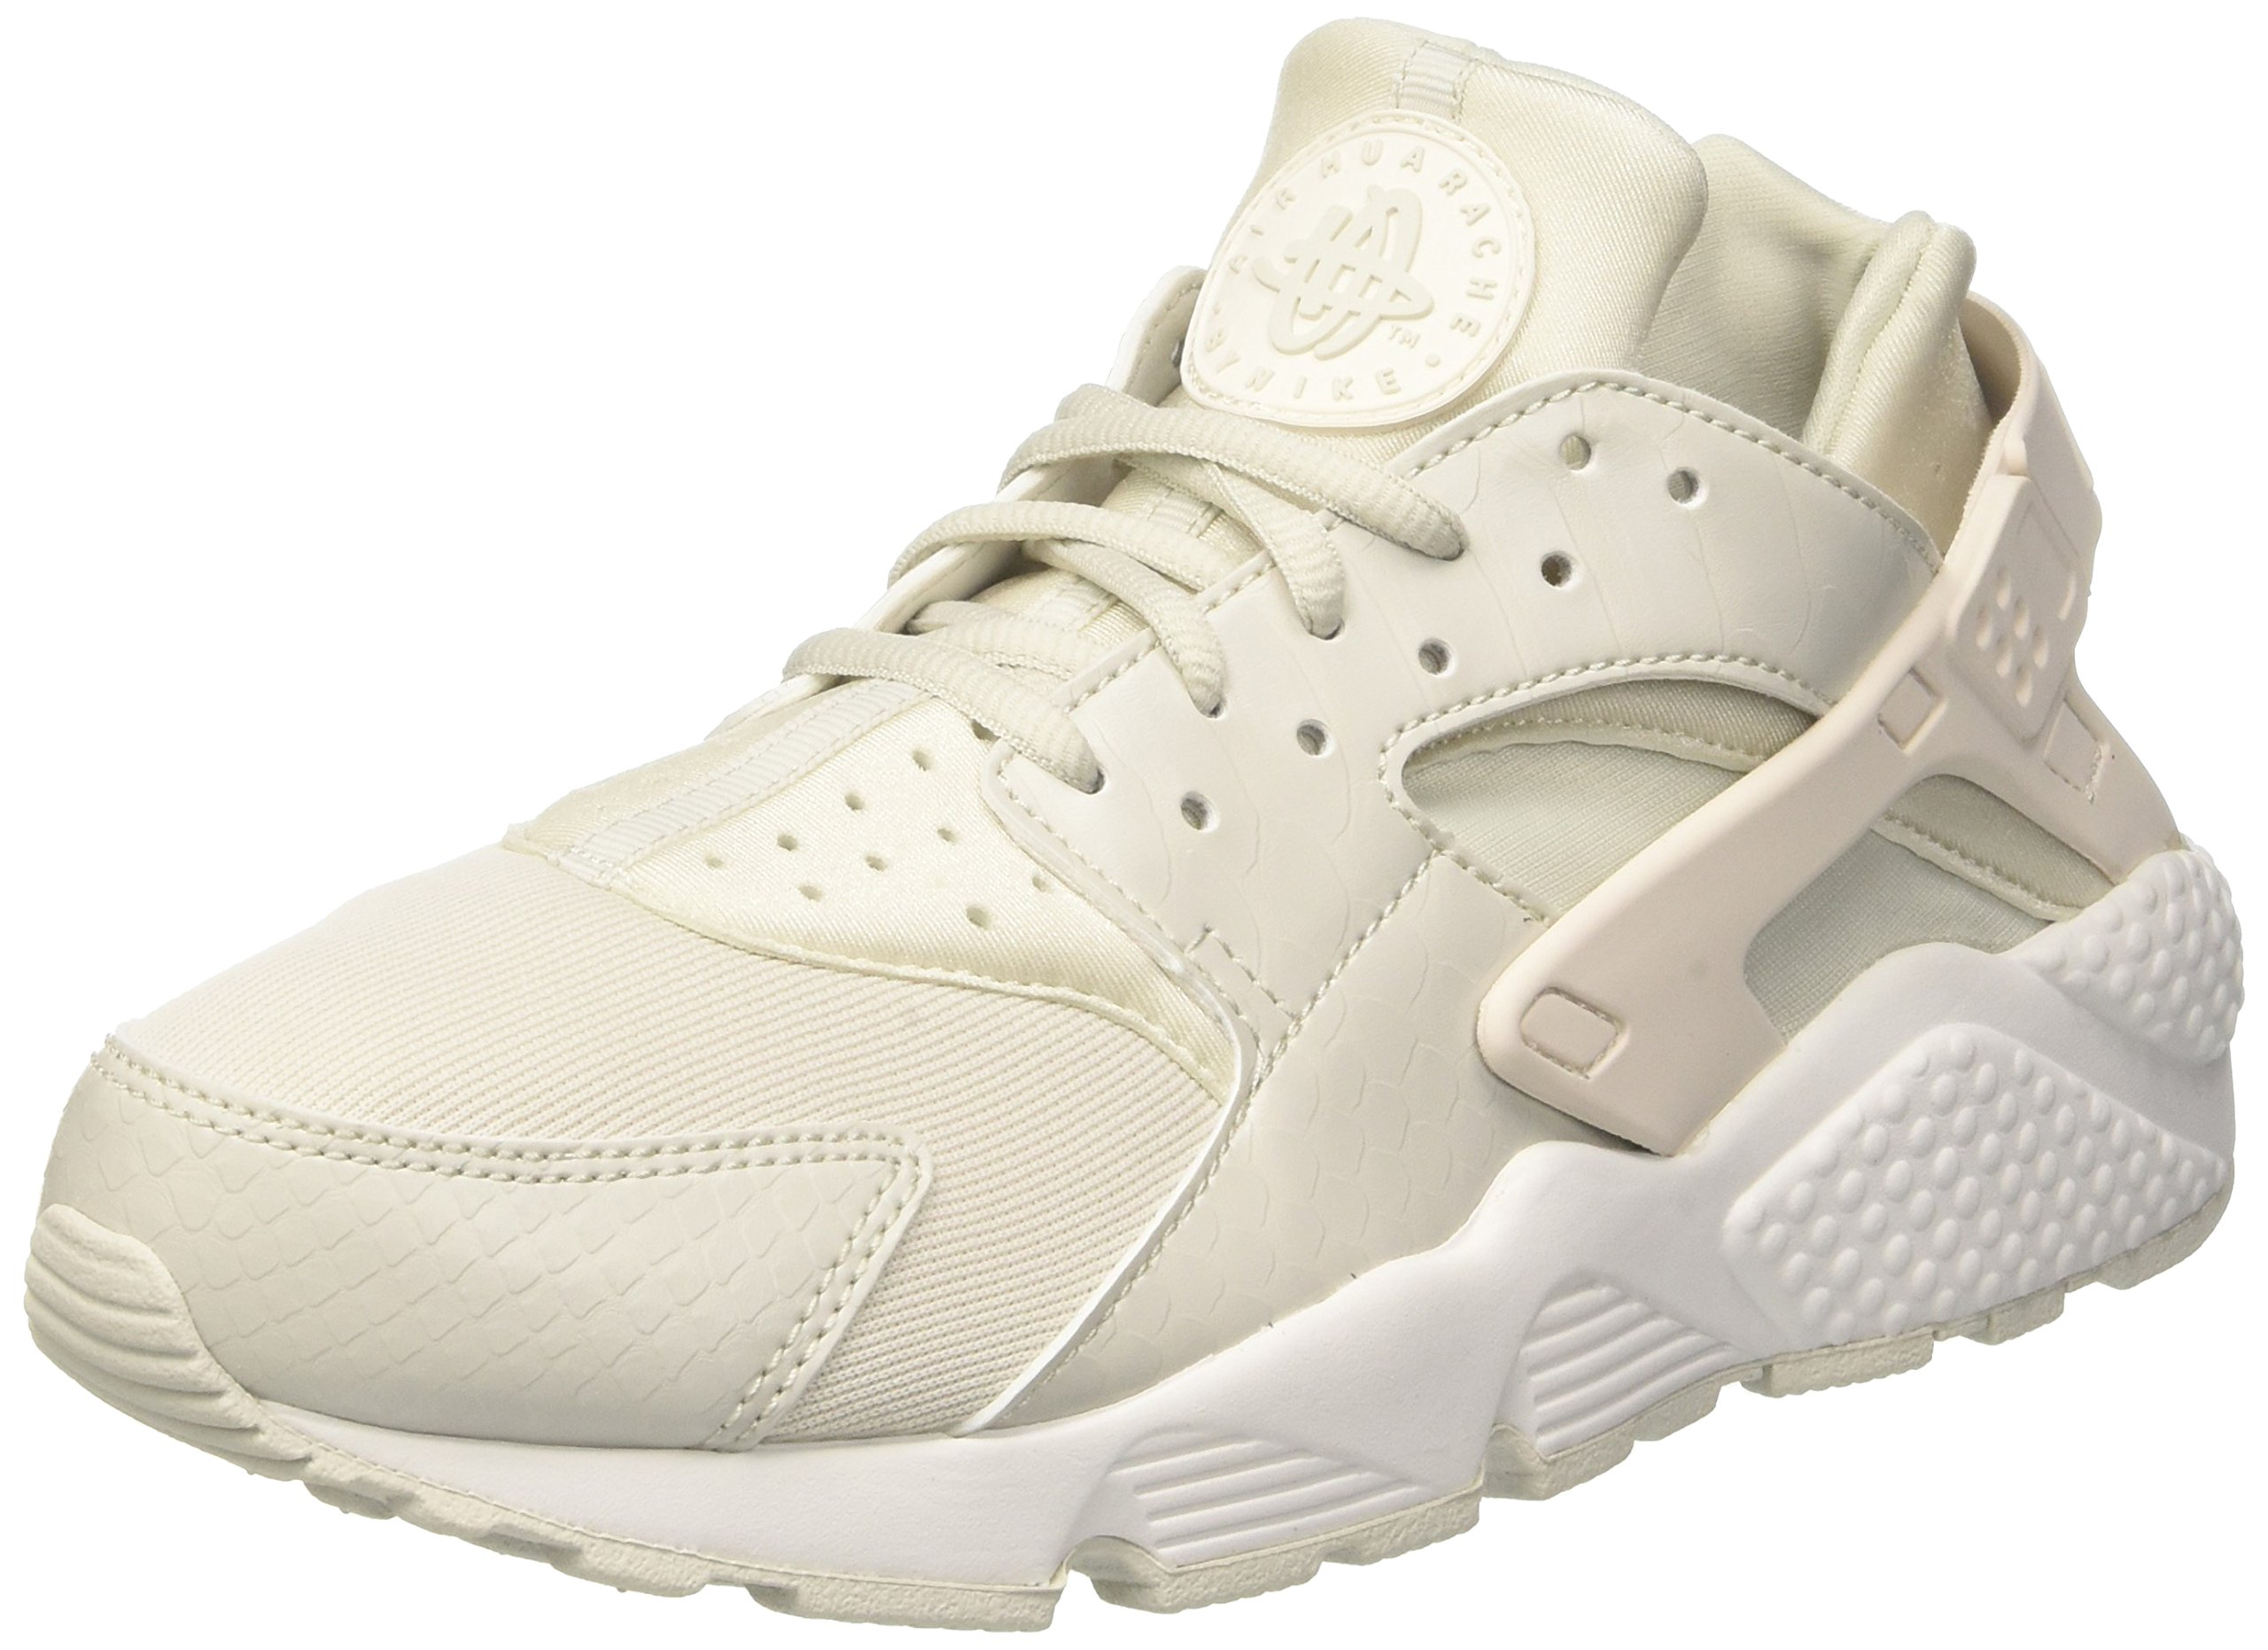 Galleon - NIKE Air Huarache Run Women s Running Shoes Phantom Light Bone  634835-028 (8.5 B(M) US) 0a16c9c05c7b